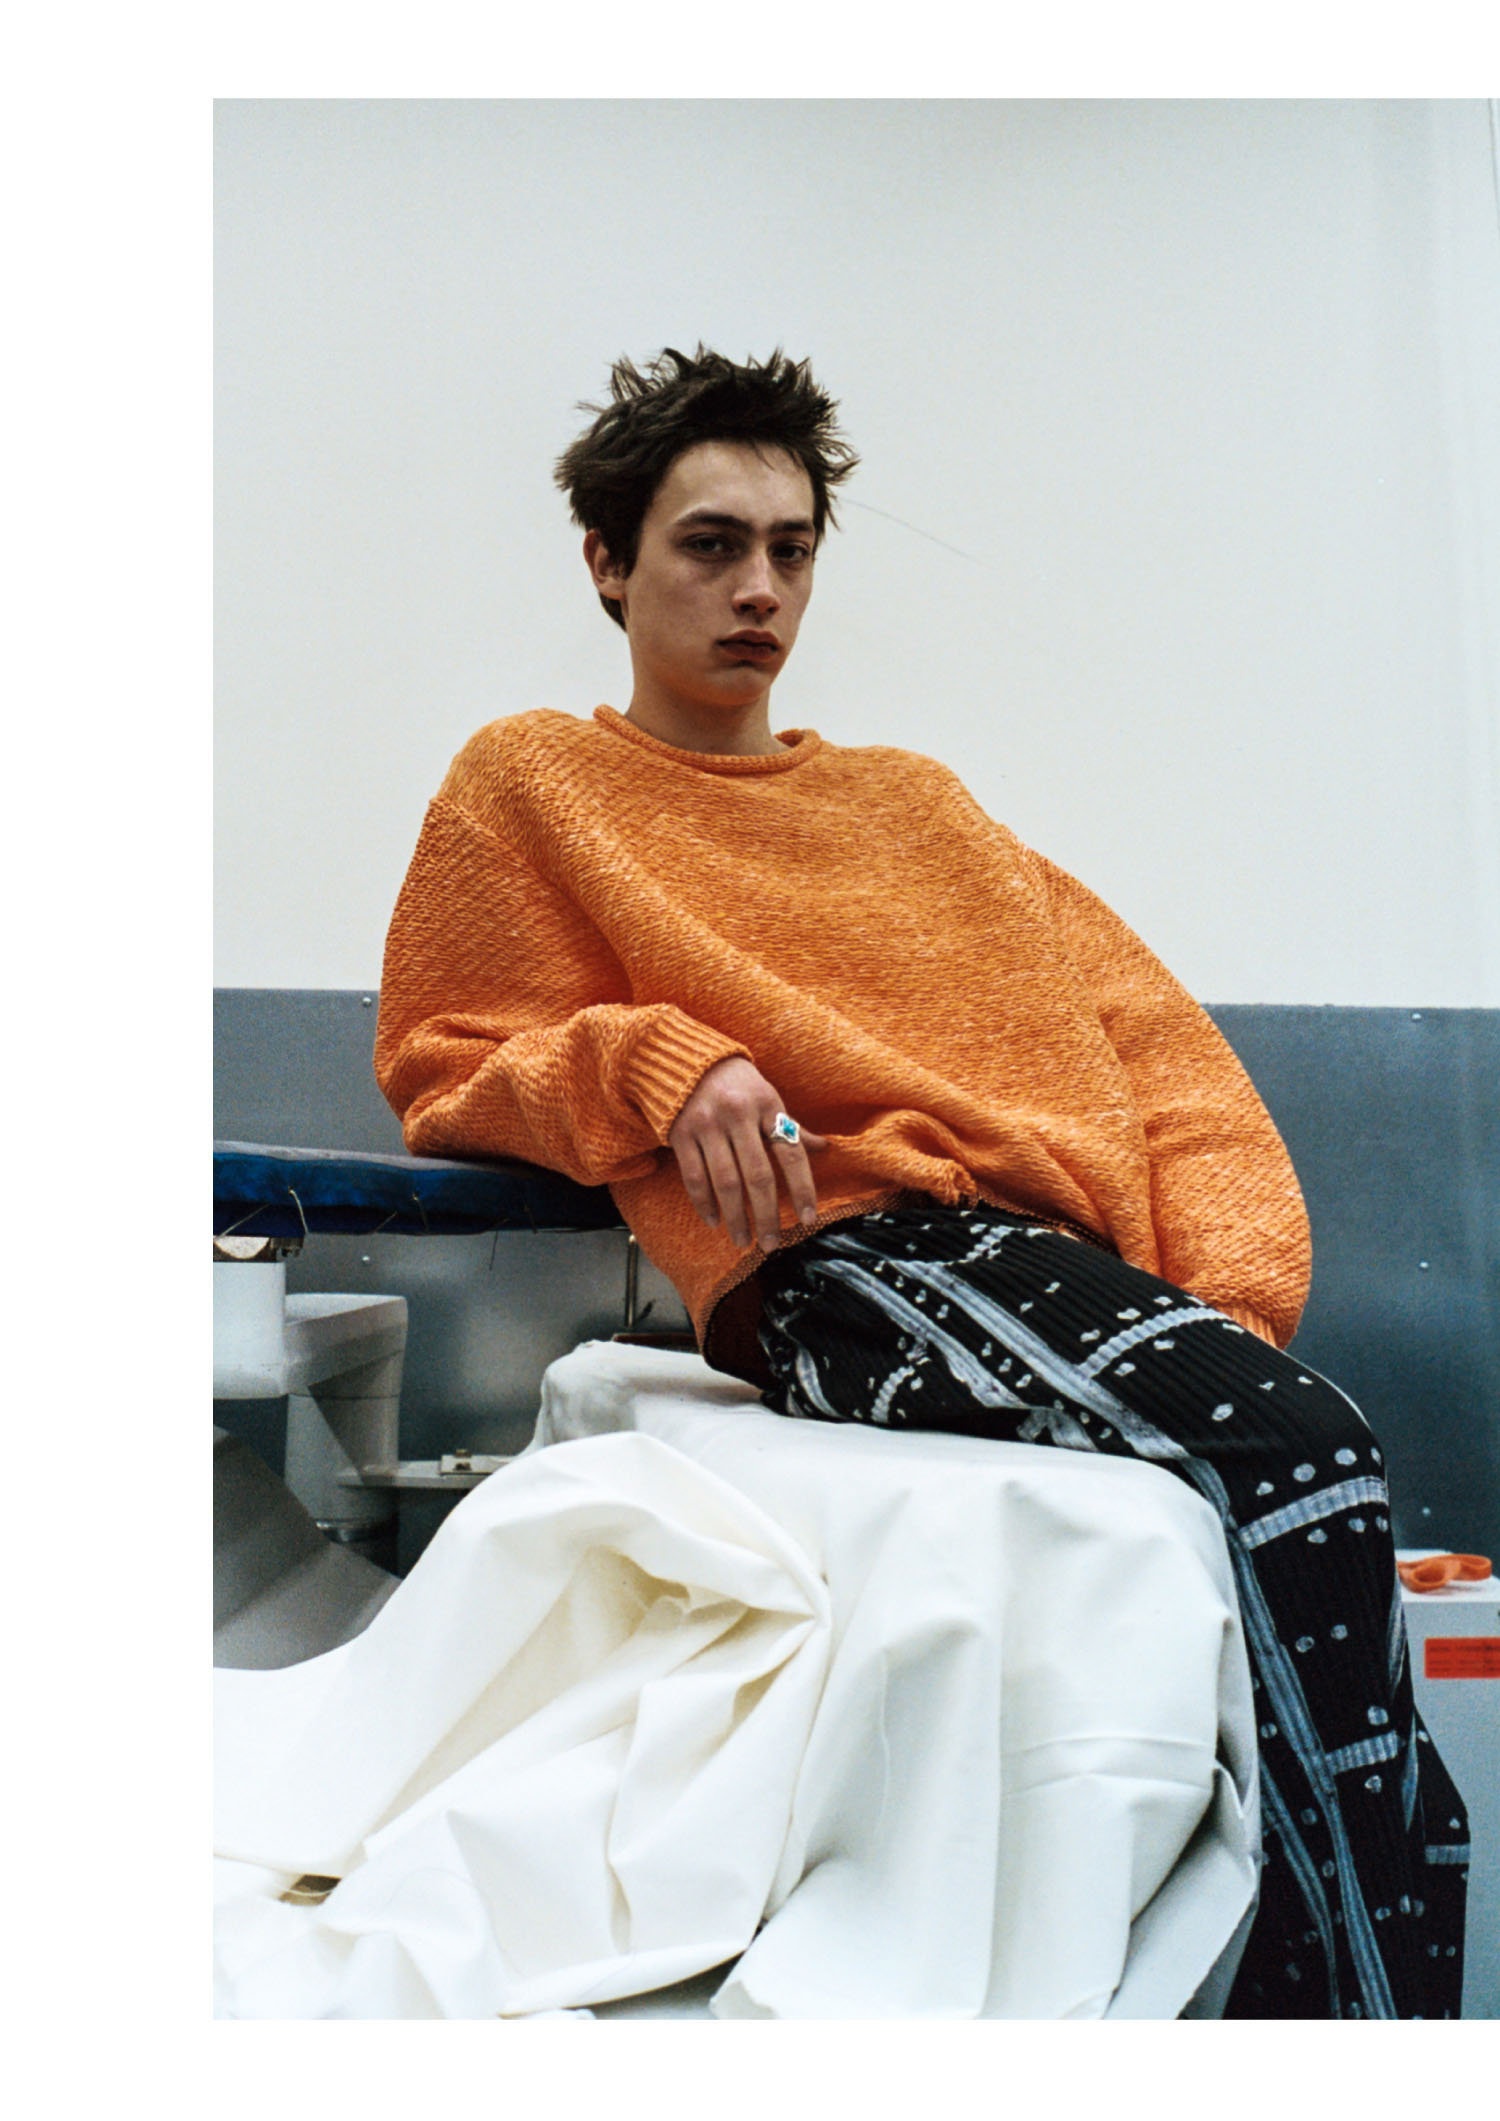 Knitwear - Acne Studios Trousers - Issey Miyake